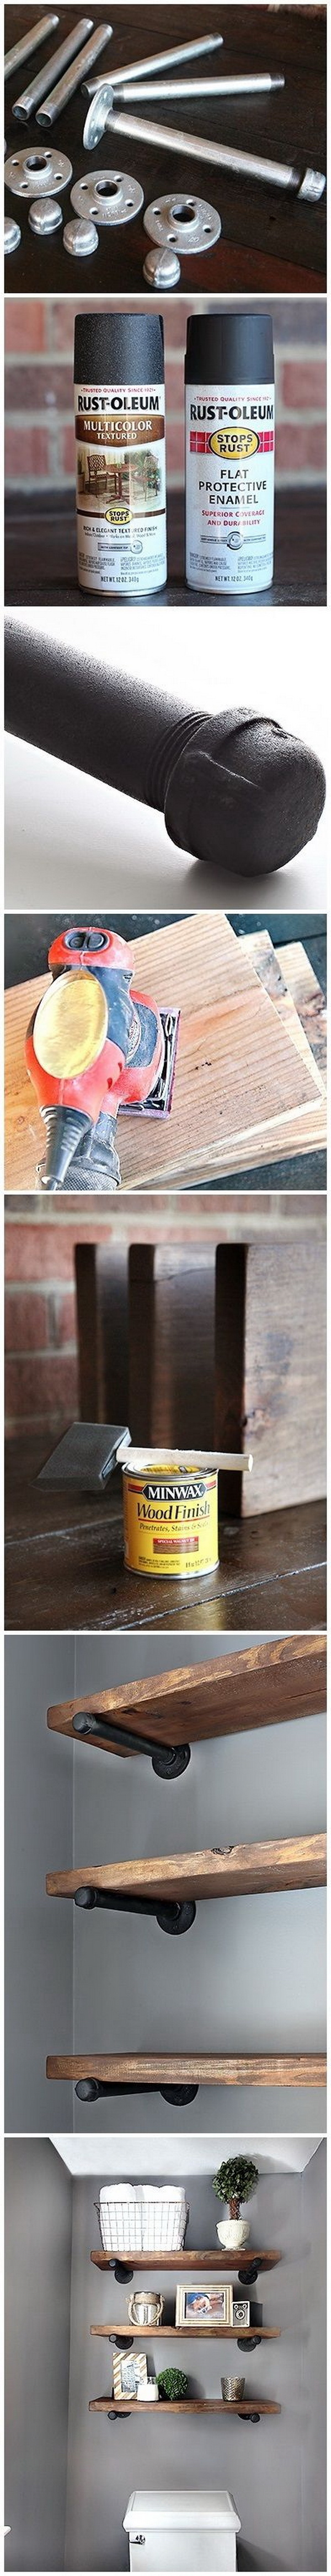 DIY Restoration Hardware Inspired Shelf.